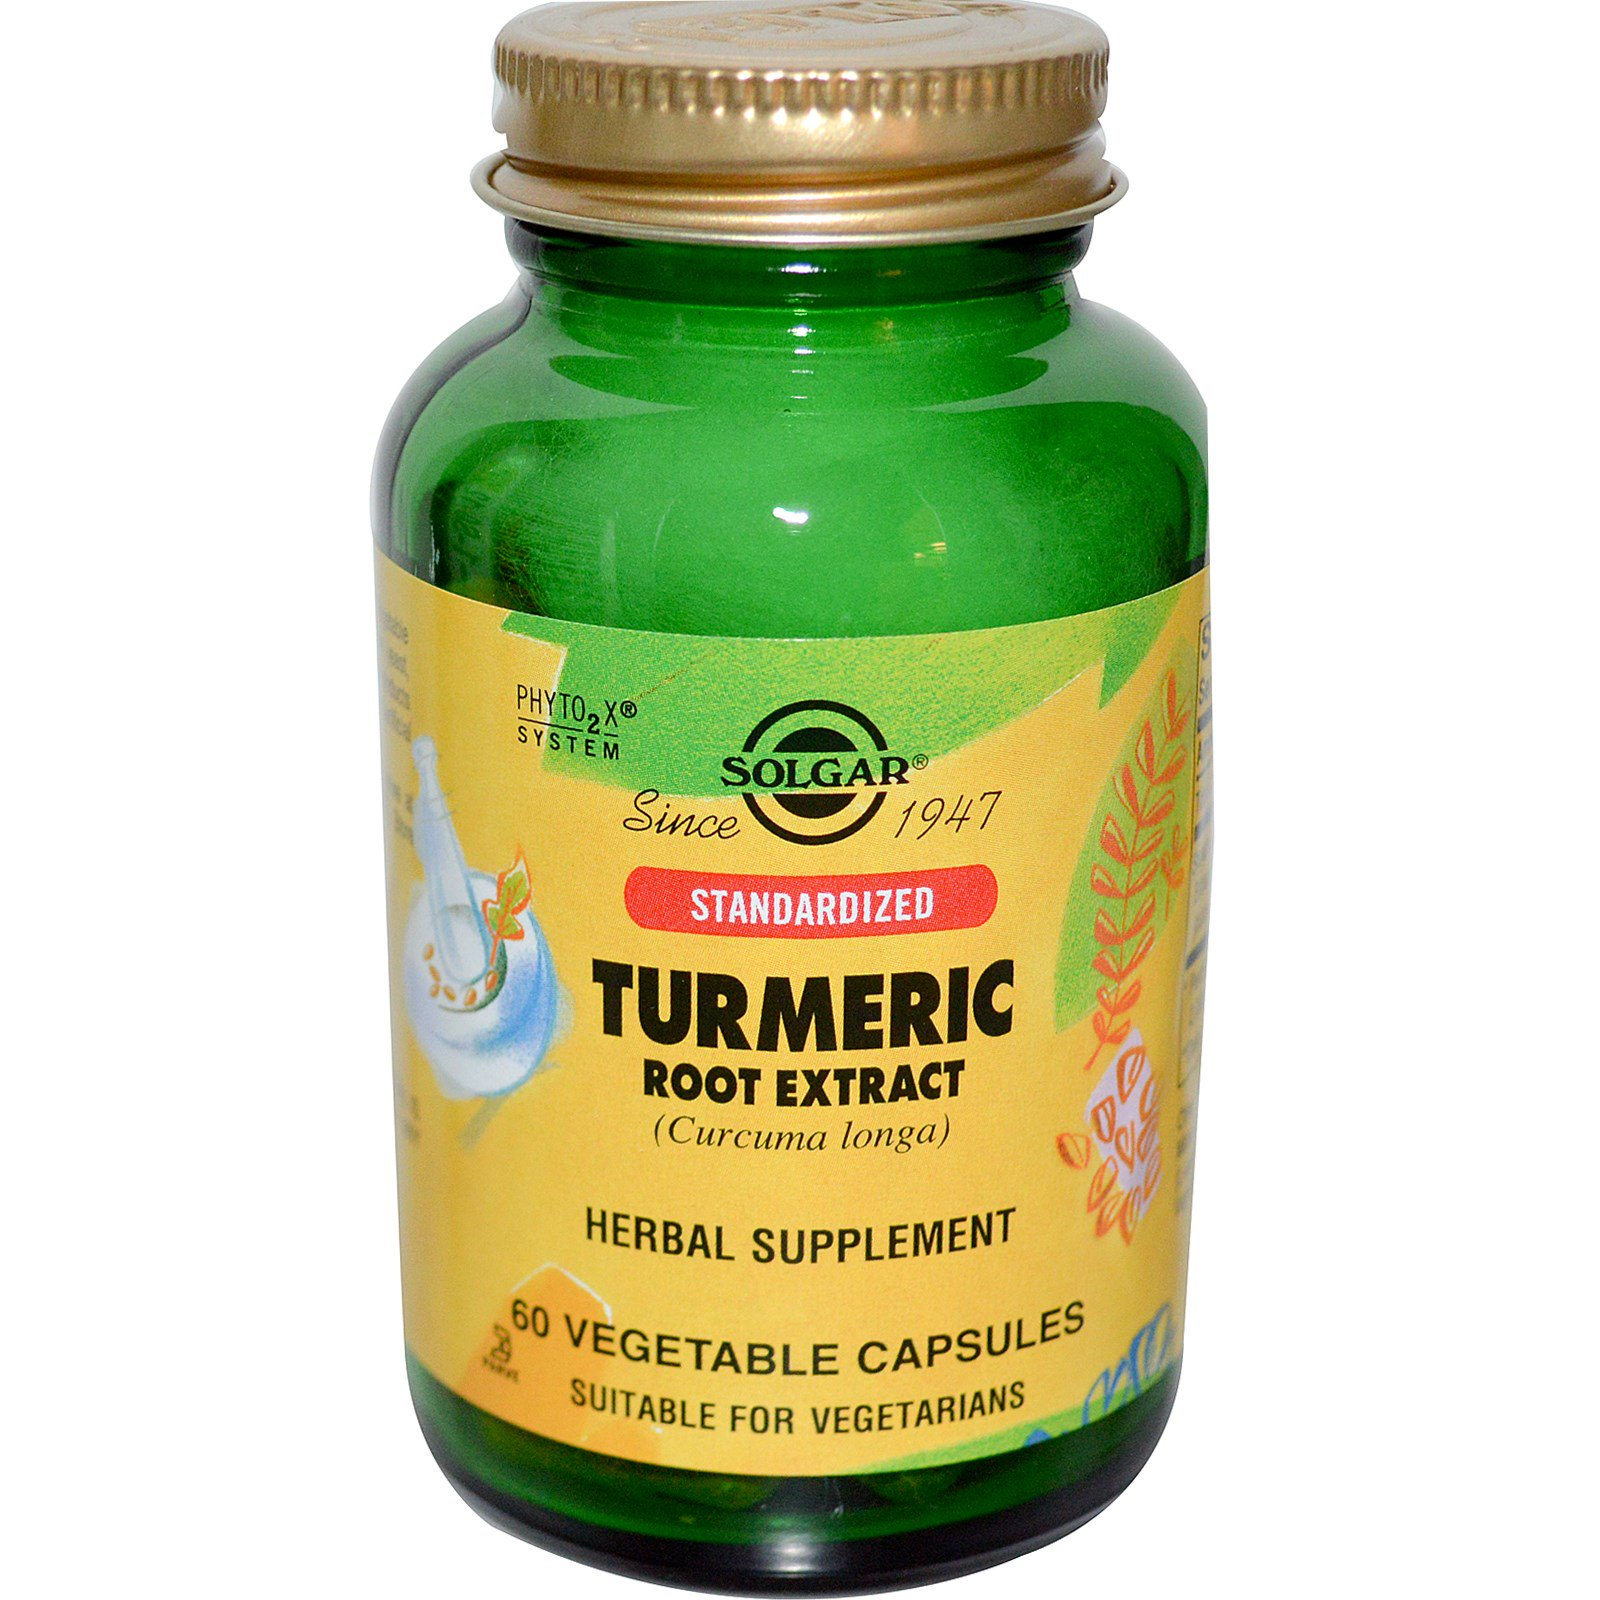 Solgar, Standardized Turmeric Root Extract, 60 Veggie Caps